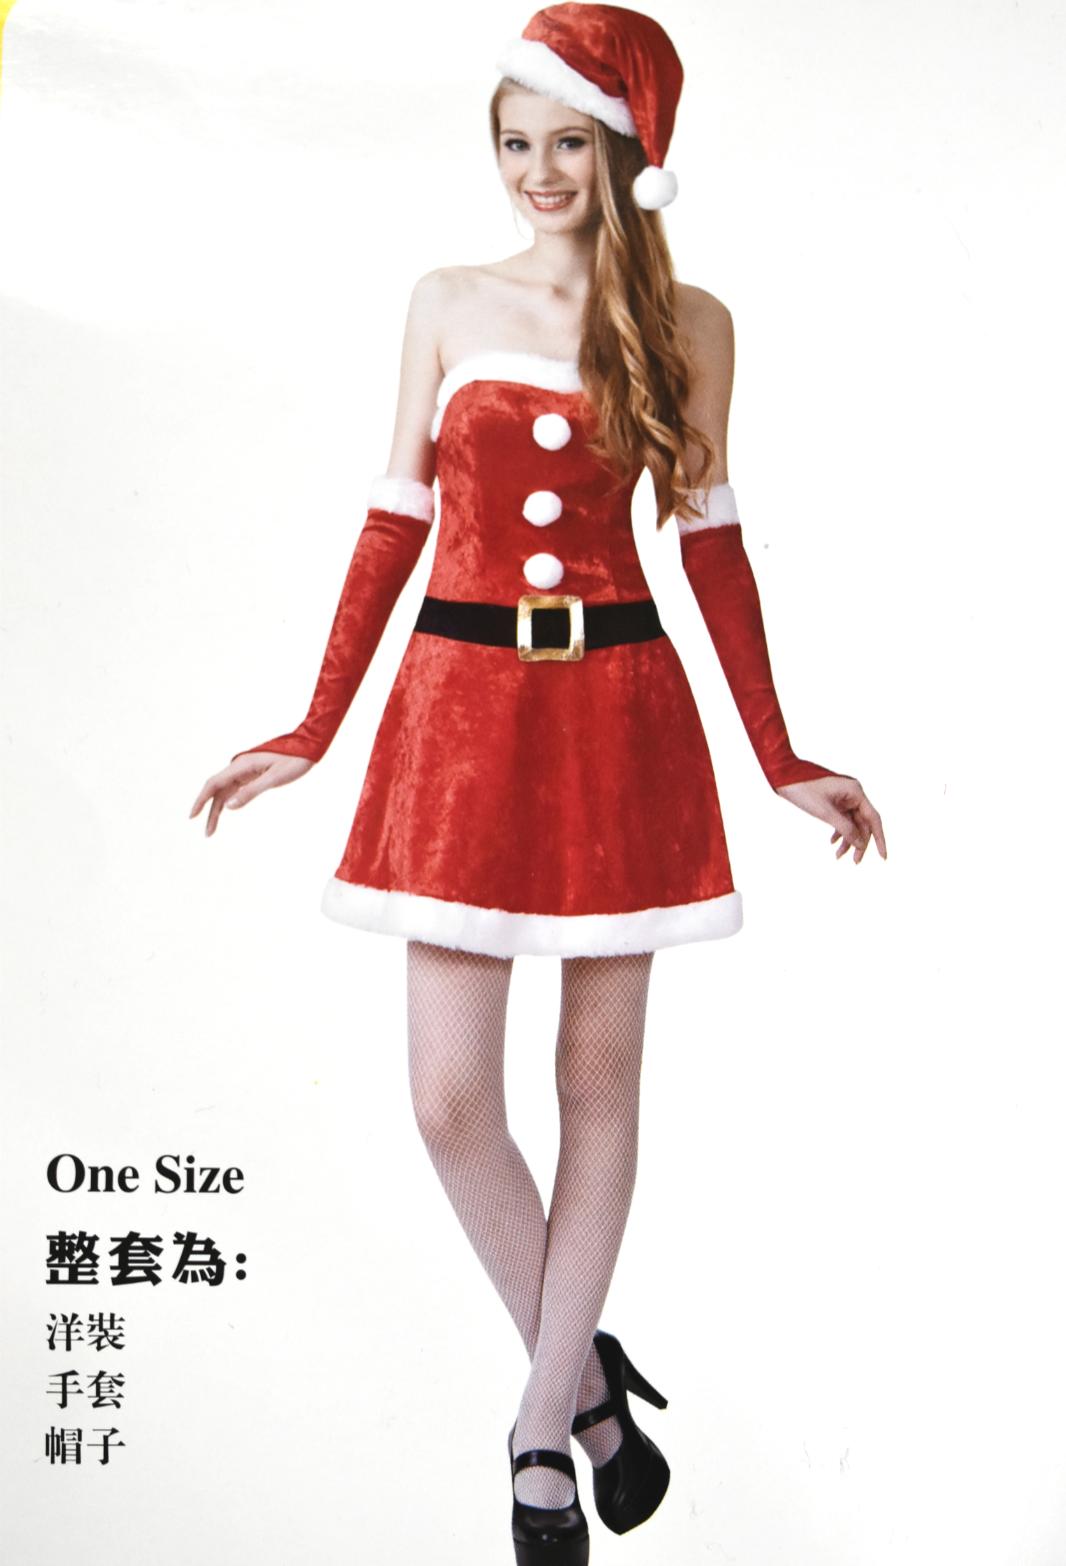 X射线【X380162】丝绒平口圣诞服(附袖套), 舞会/尾牙/万圣/圣诞/大人变装/cosplay/表演/摄影/写真/话剧/童话/性感/交换礼物